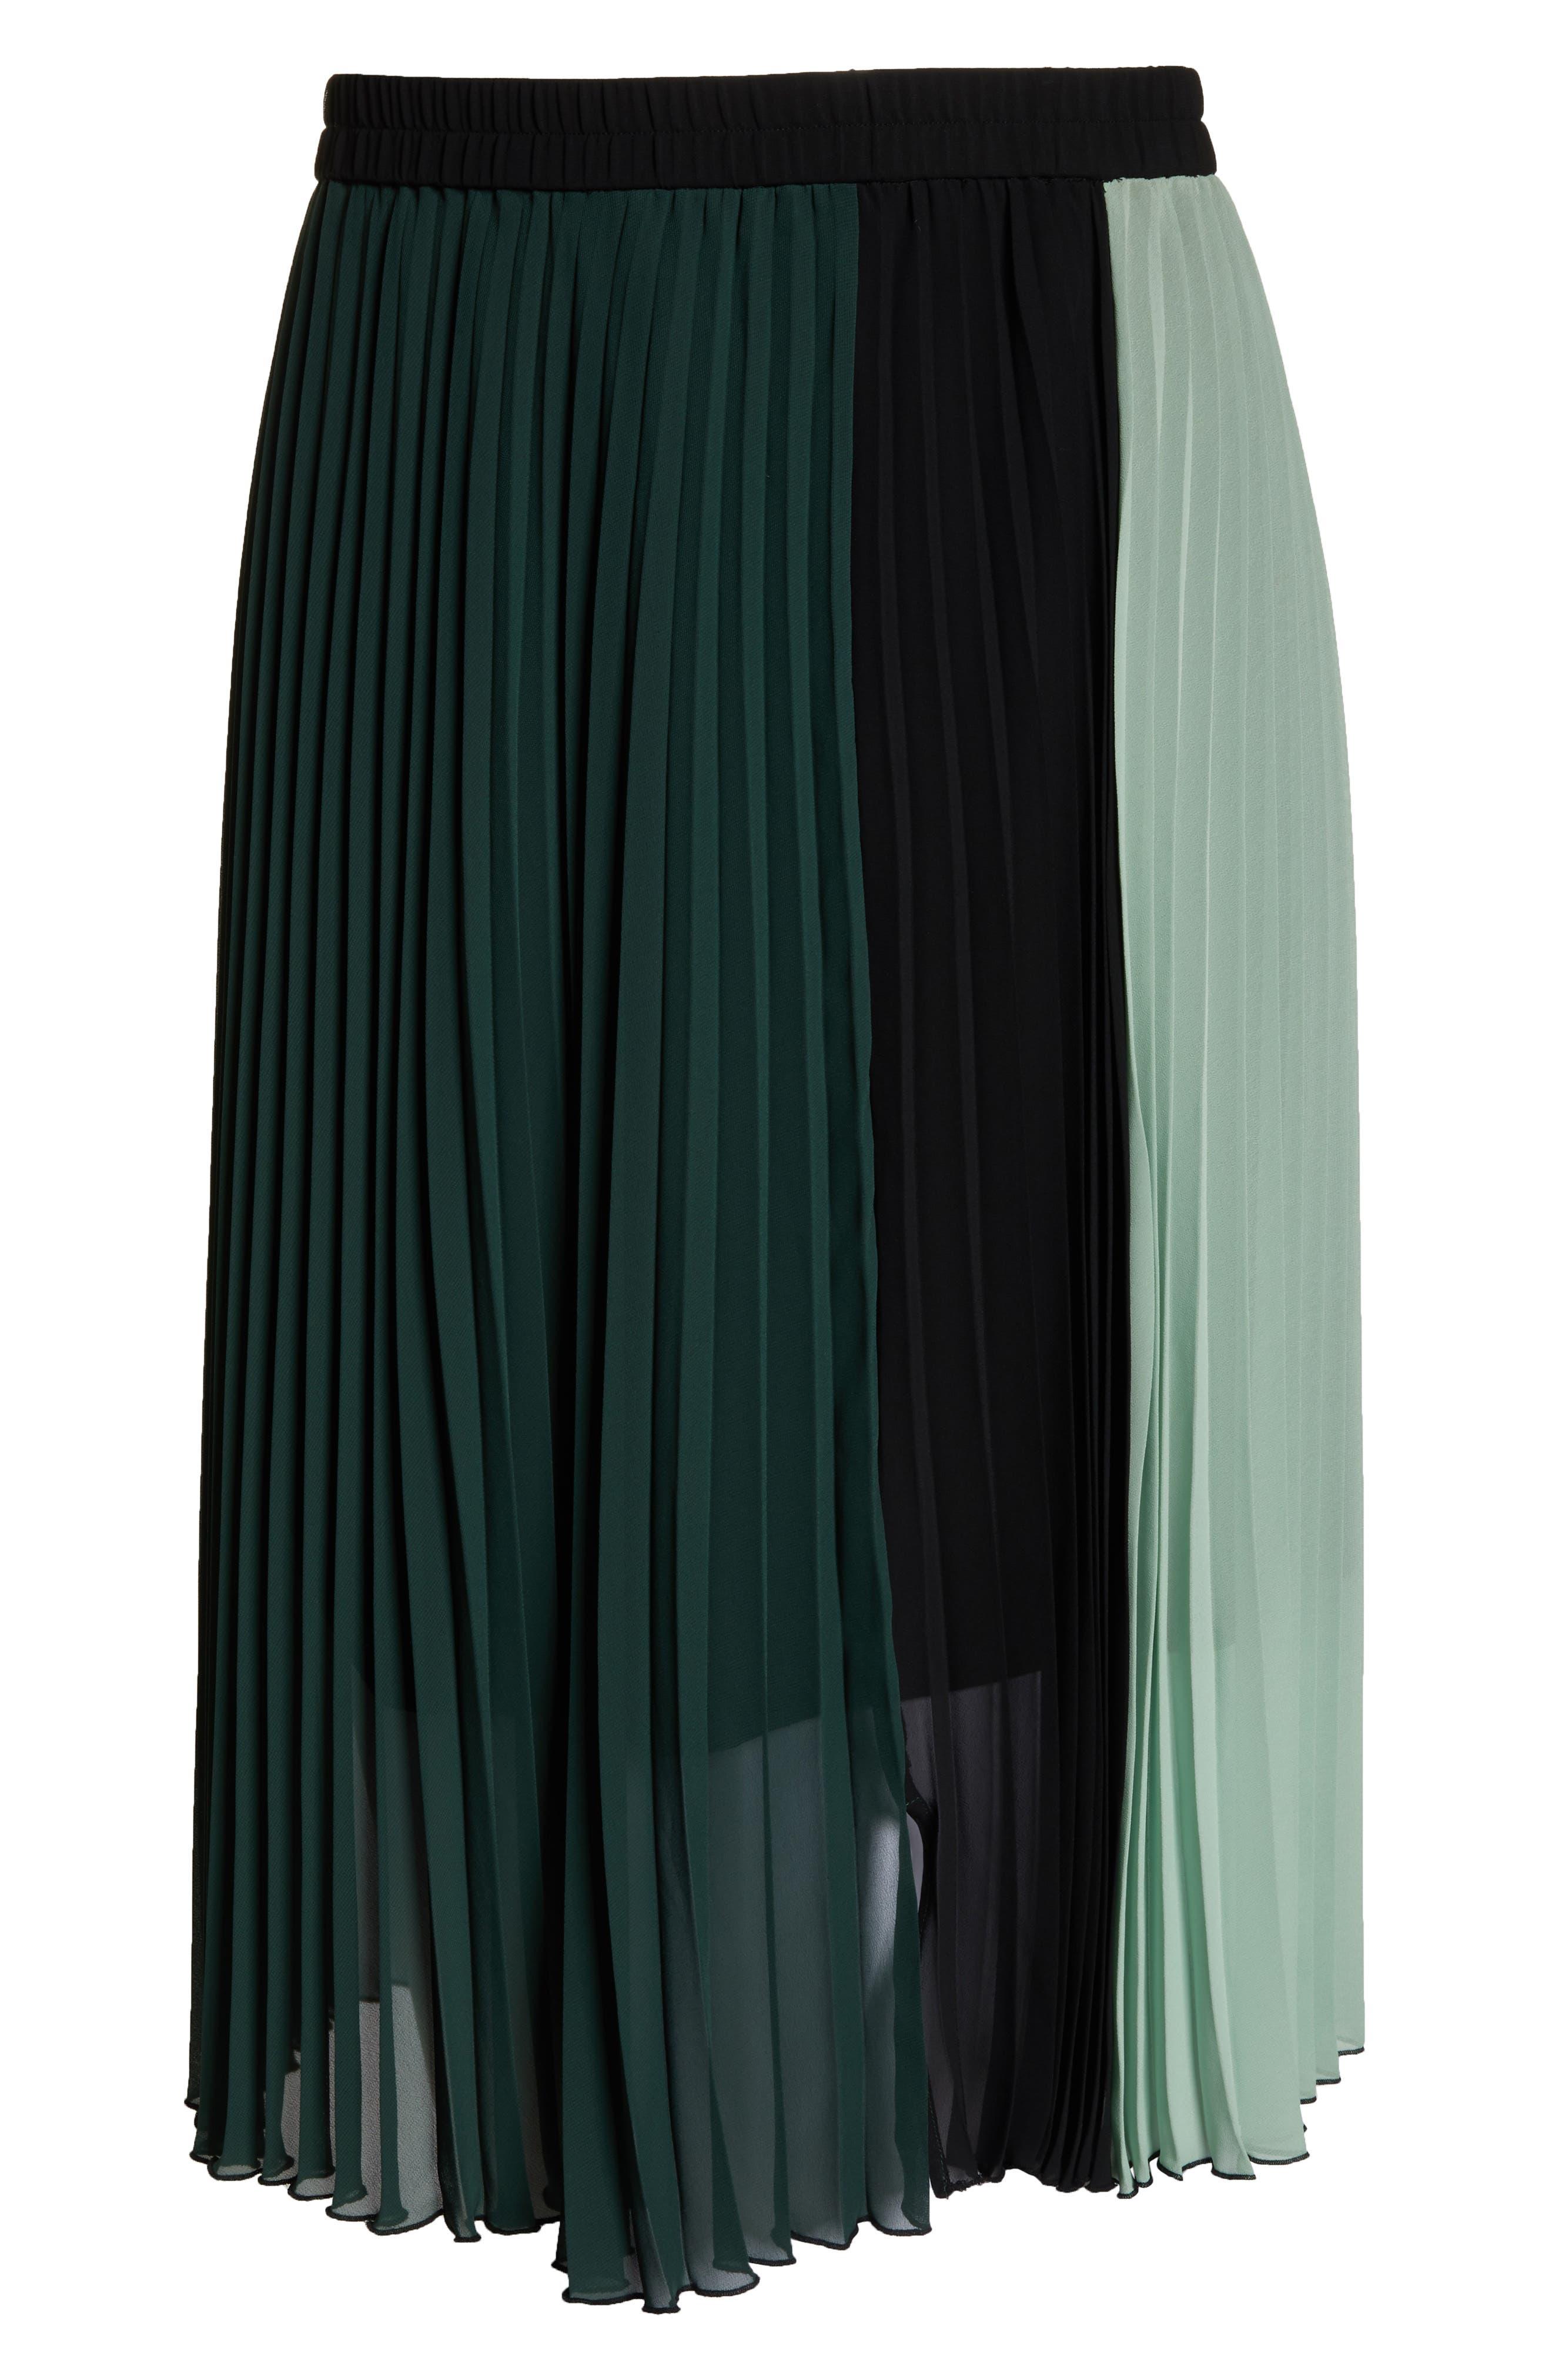 x Atlantic-Pacific Colorblock Pleated Midi Skirt,                             Alternate thumbnail 6, color,                             GREEN- BLACK COLORBLOCK